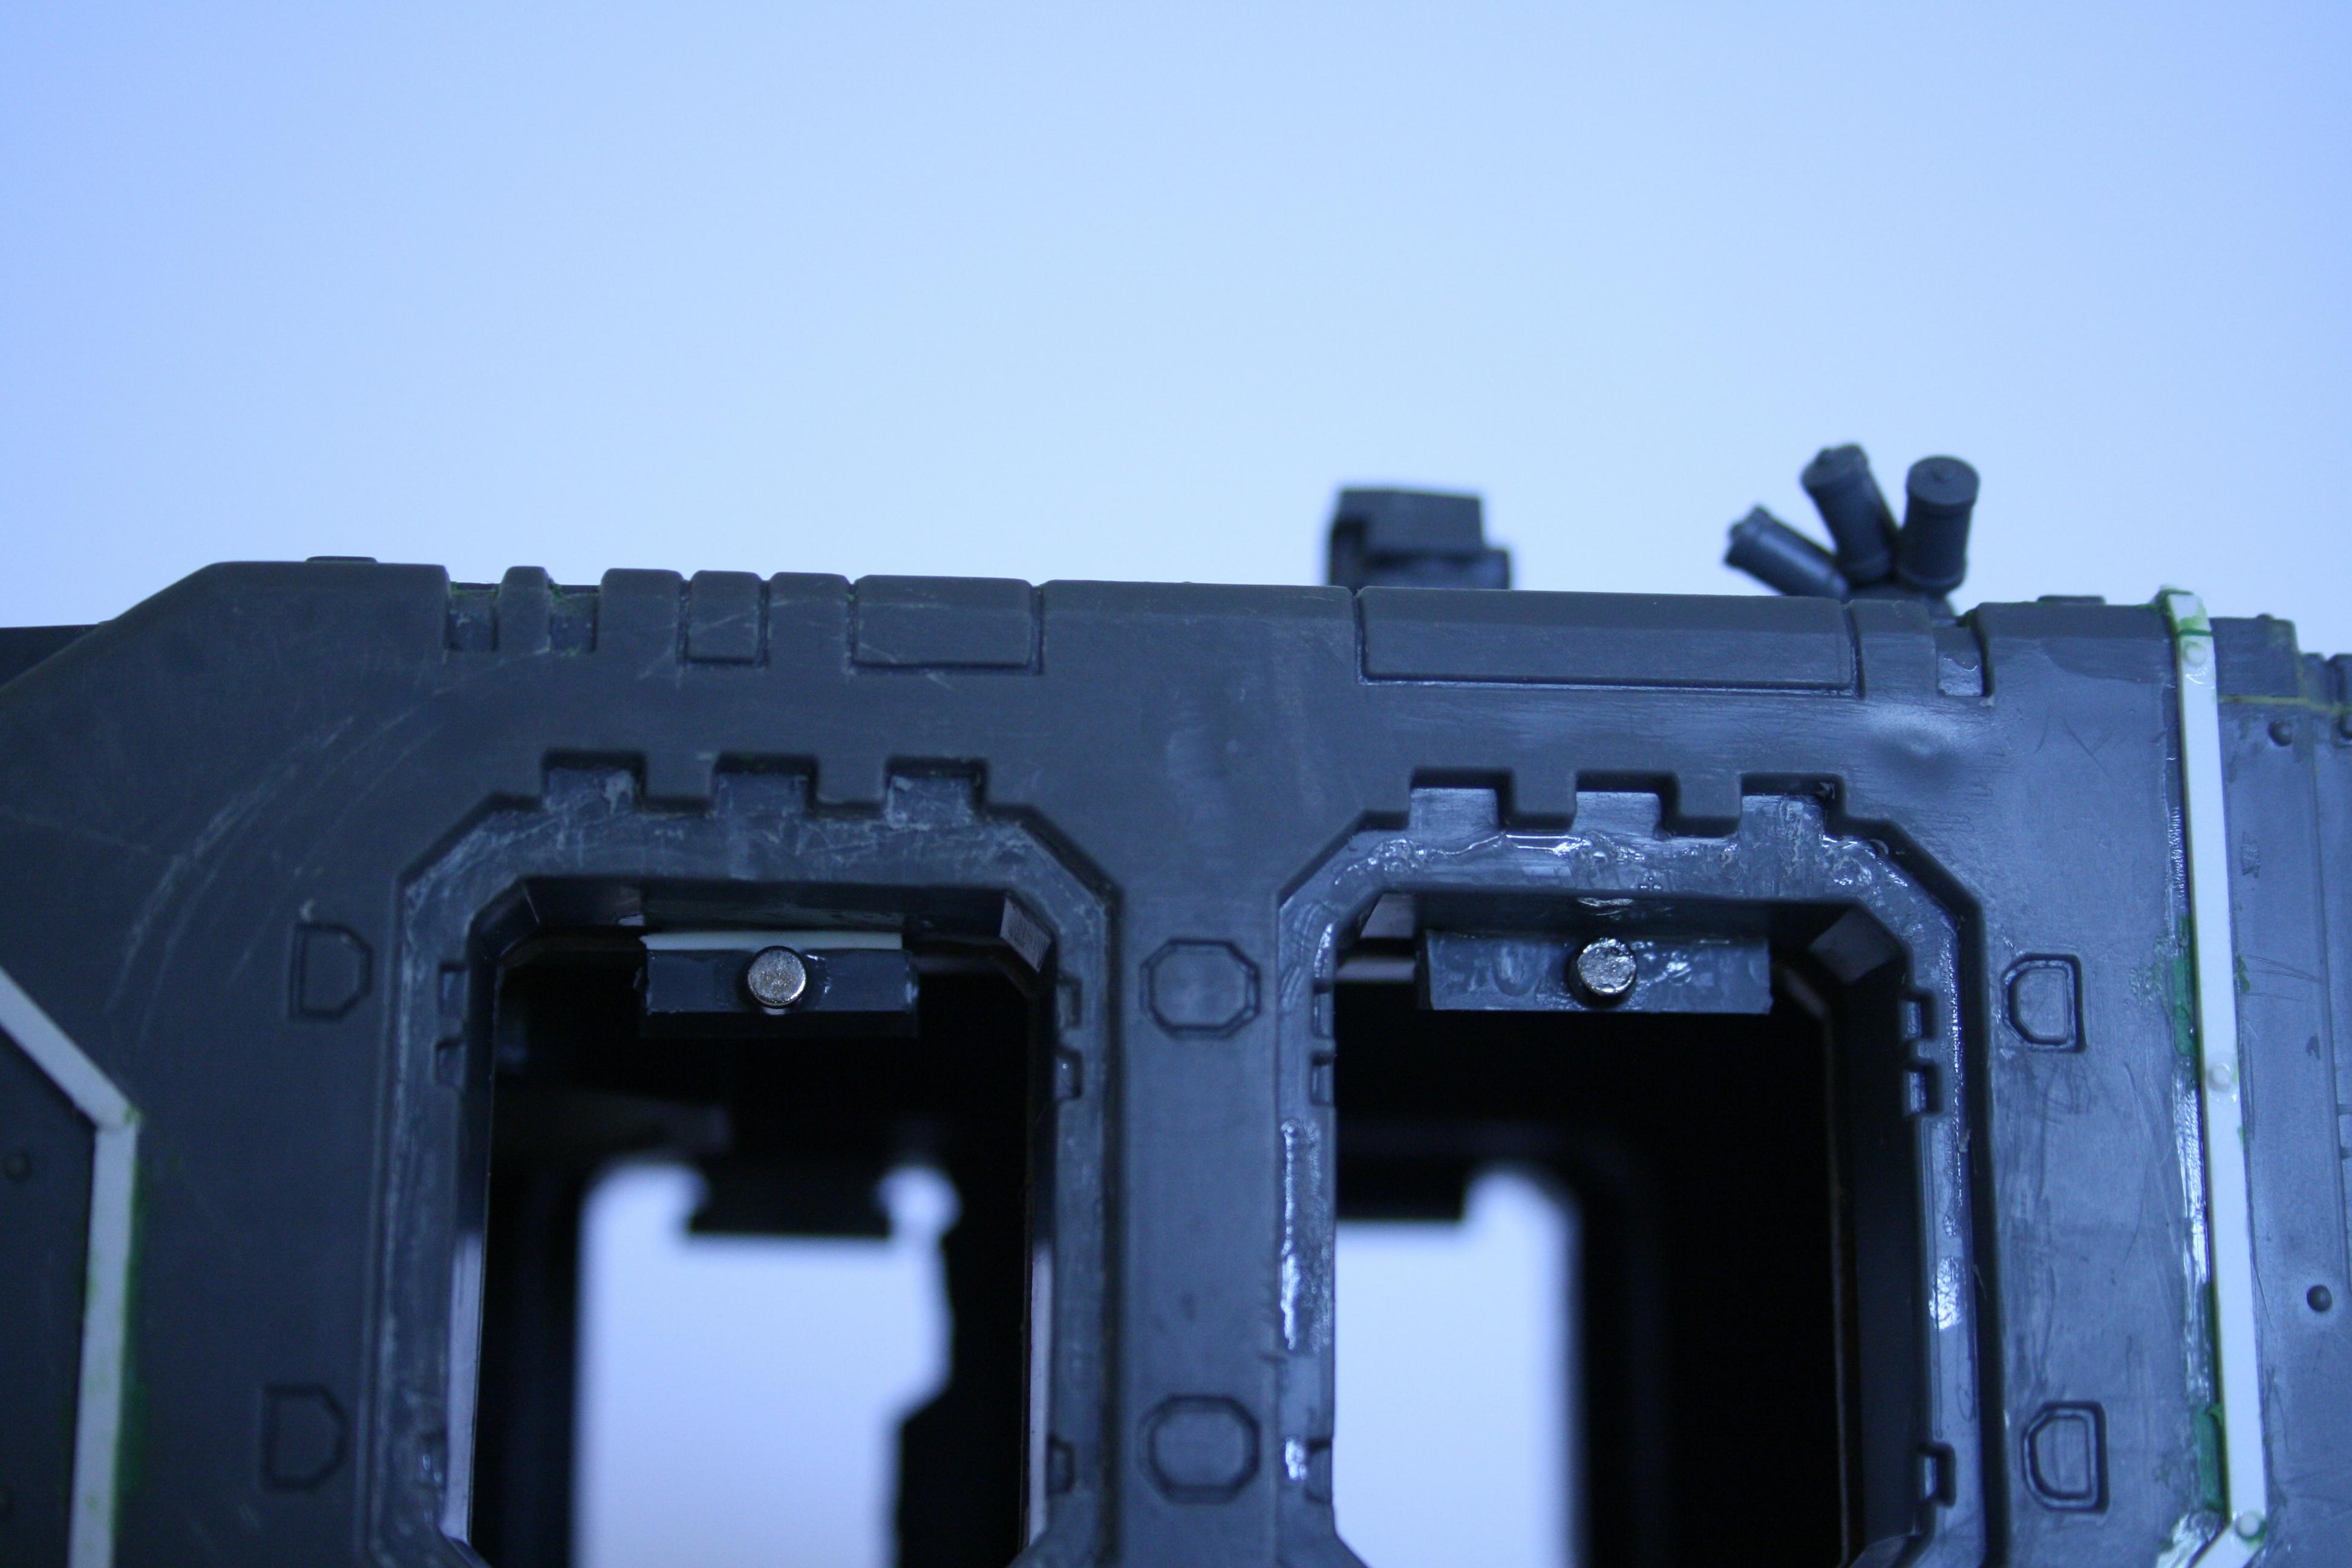 magnet mounts